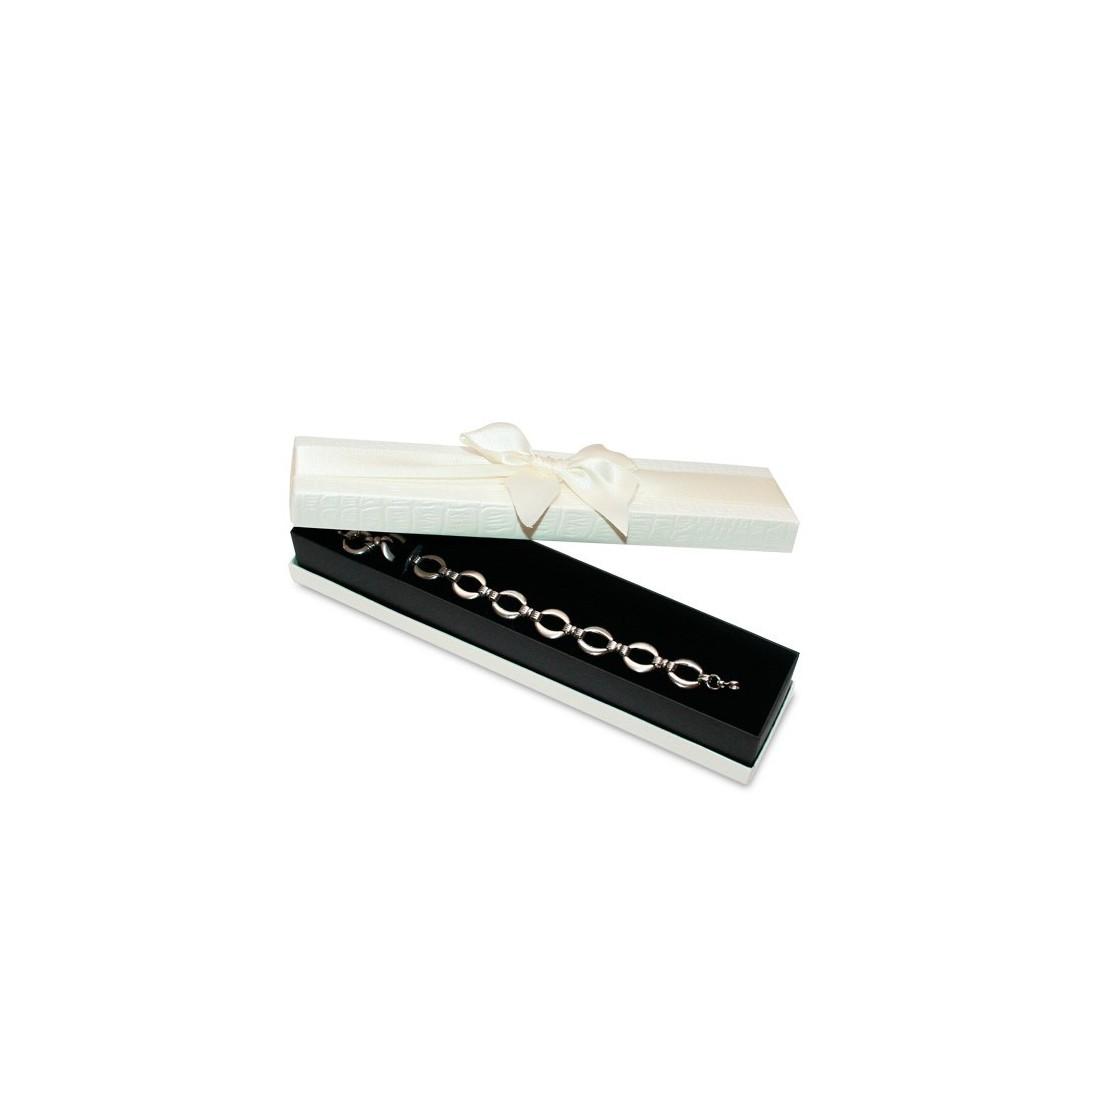 Bracelet cardboard boxes